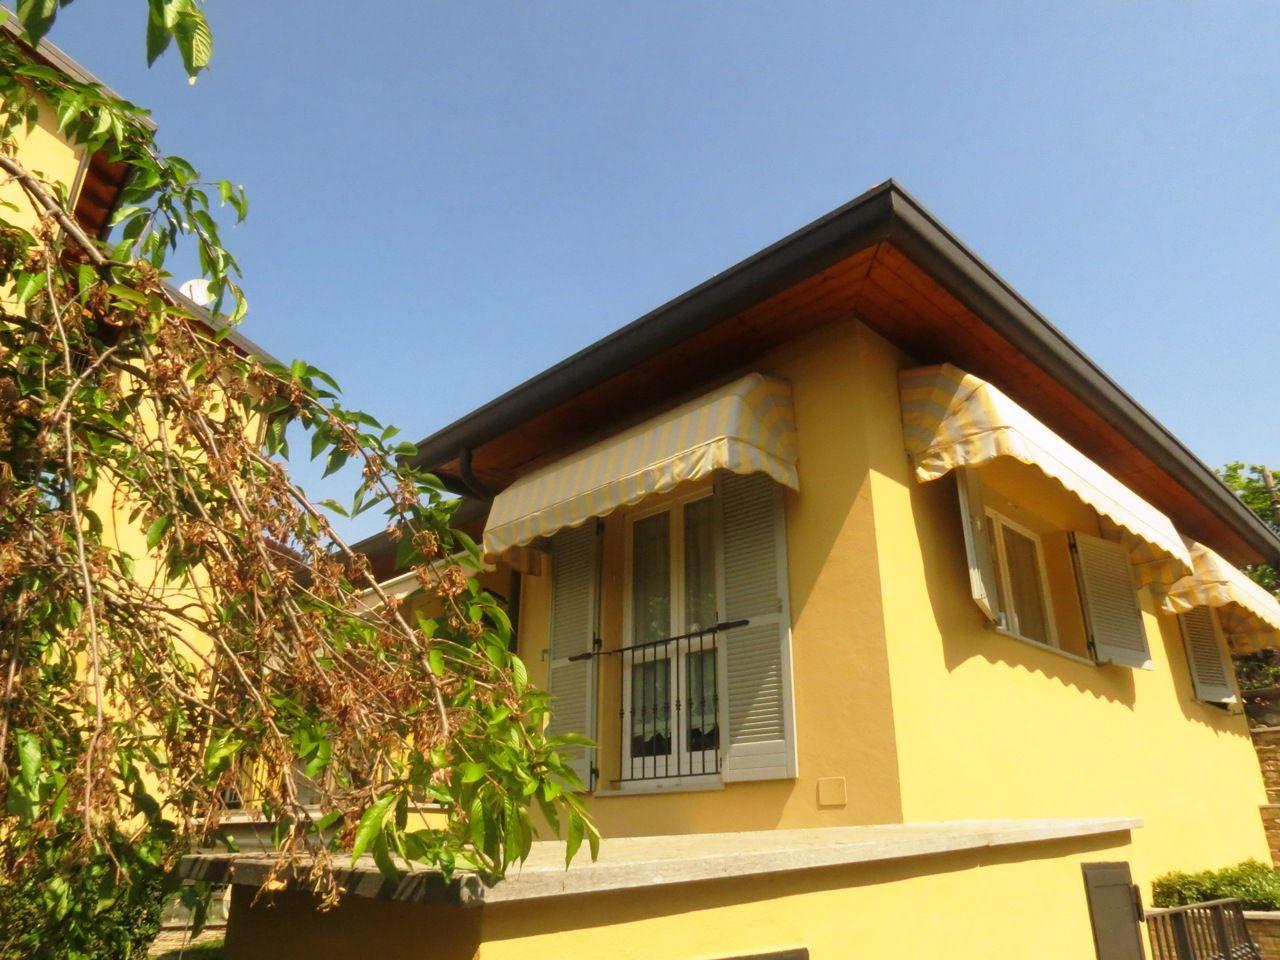 Verbania pallanza casa indipendente 3 camere con giardino for Casa piano diviso